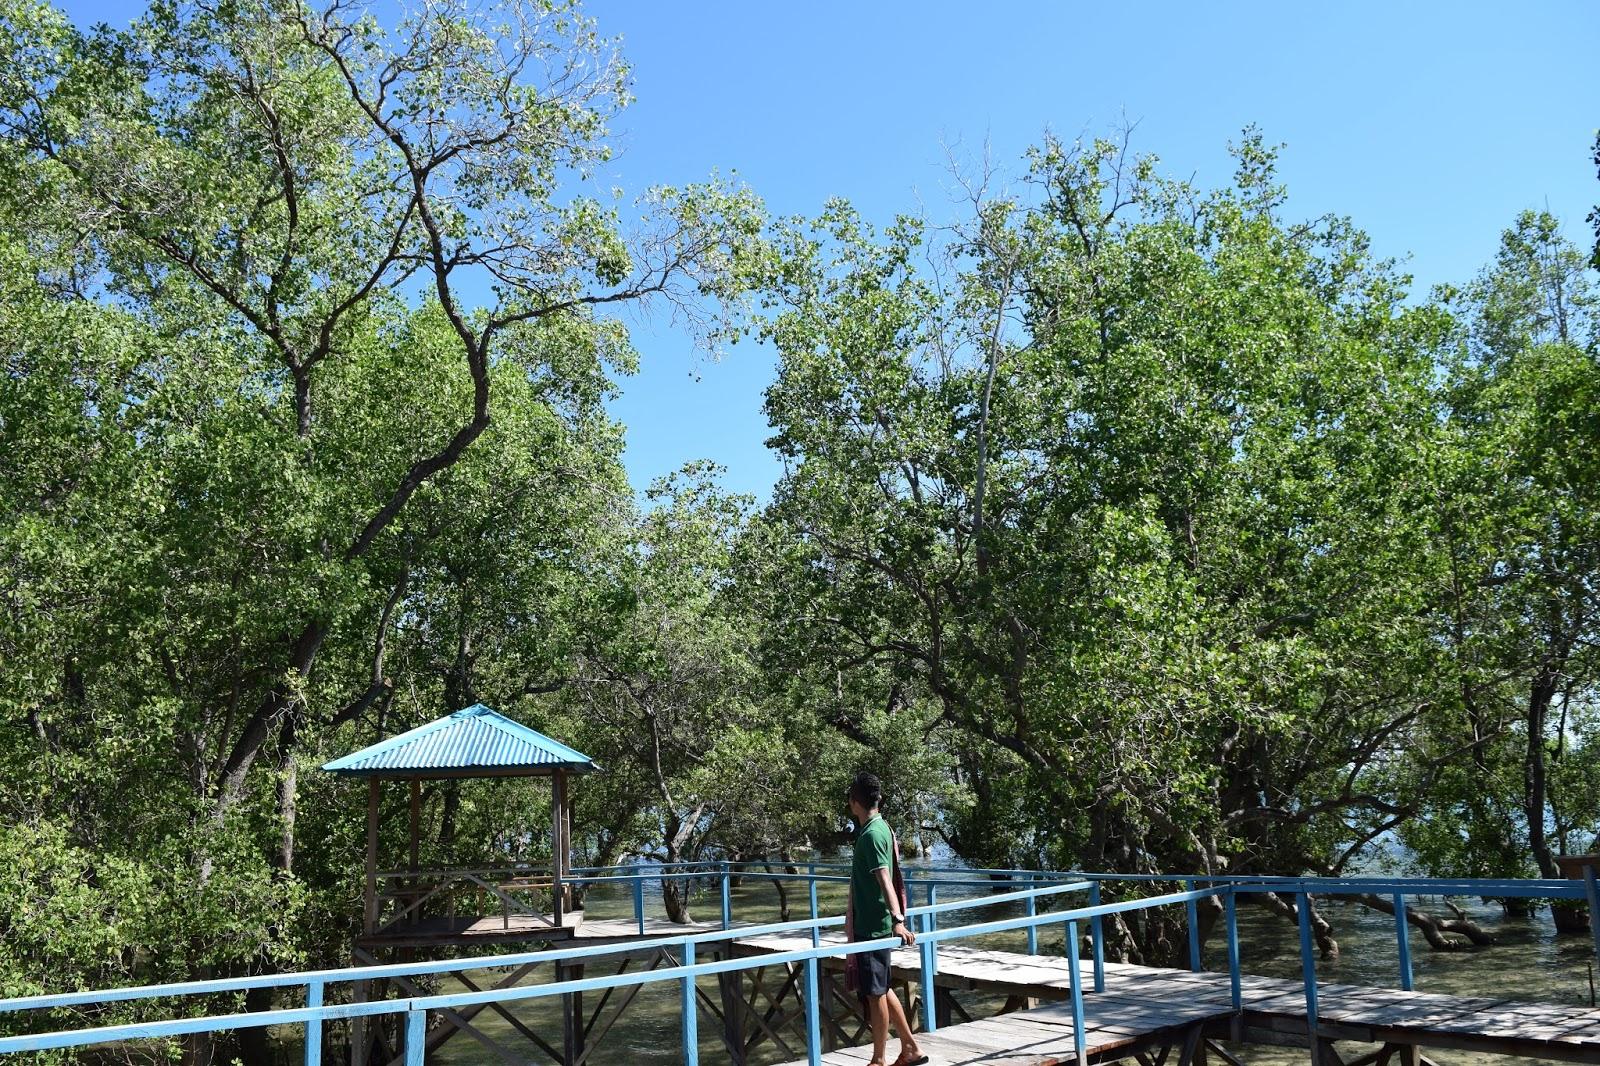 Arianto Ntt Jembatan Mangrove Kota Kupang Pantai Tedis Kab